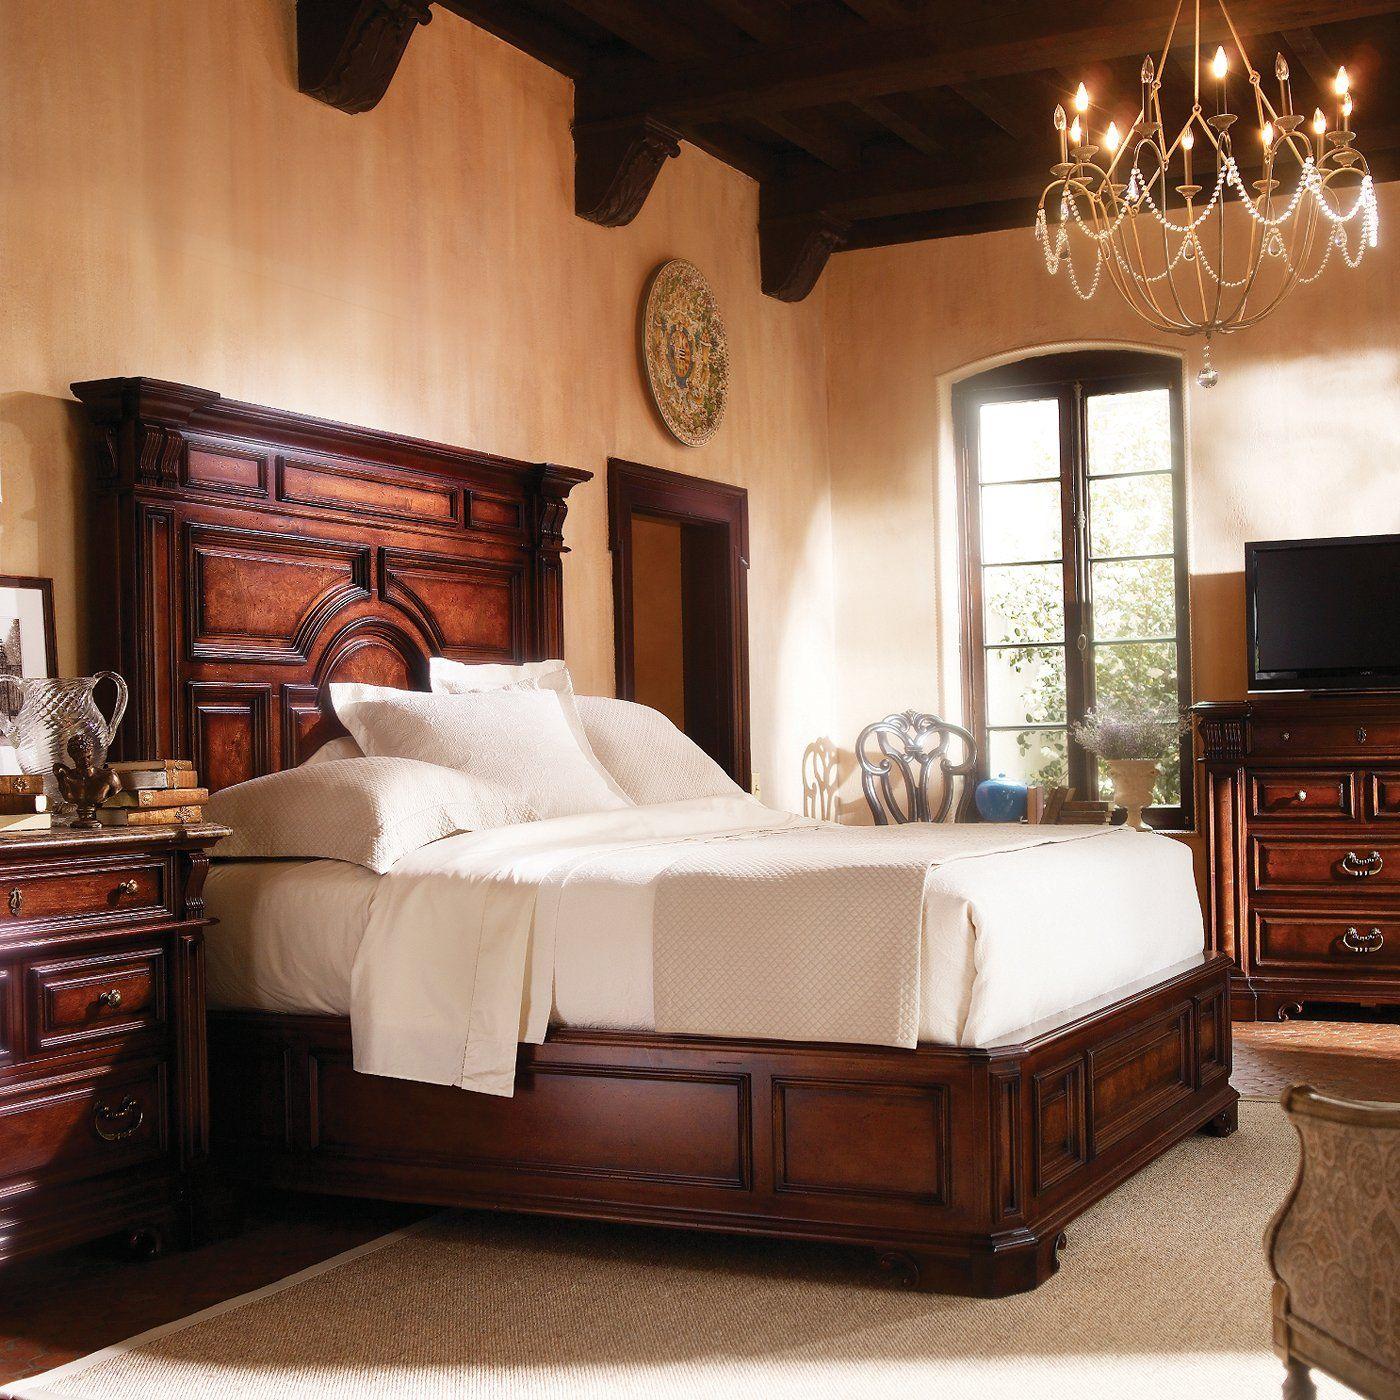 Stanley Furniture Costa del Sol Mansion Bedroom Set  Cordova. Fit for a king  Stanley Furniture Costa del Sol Mansion Bedroom